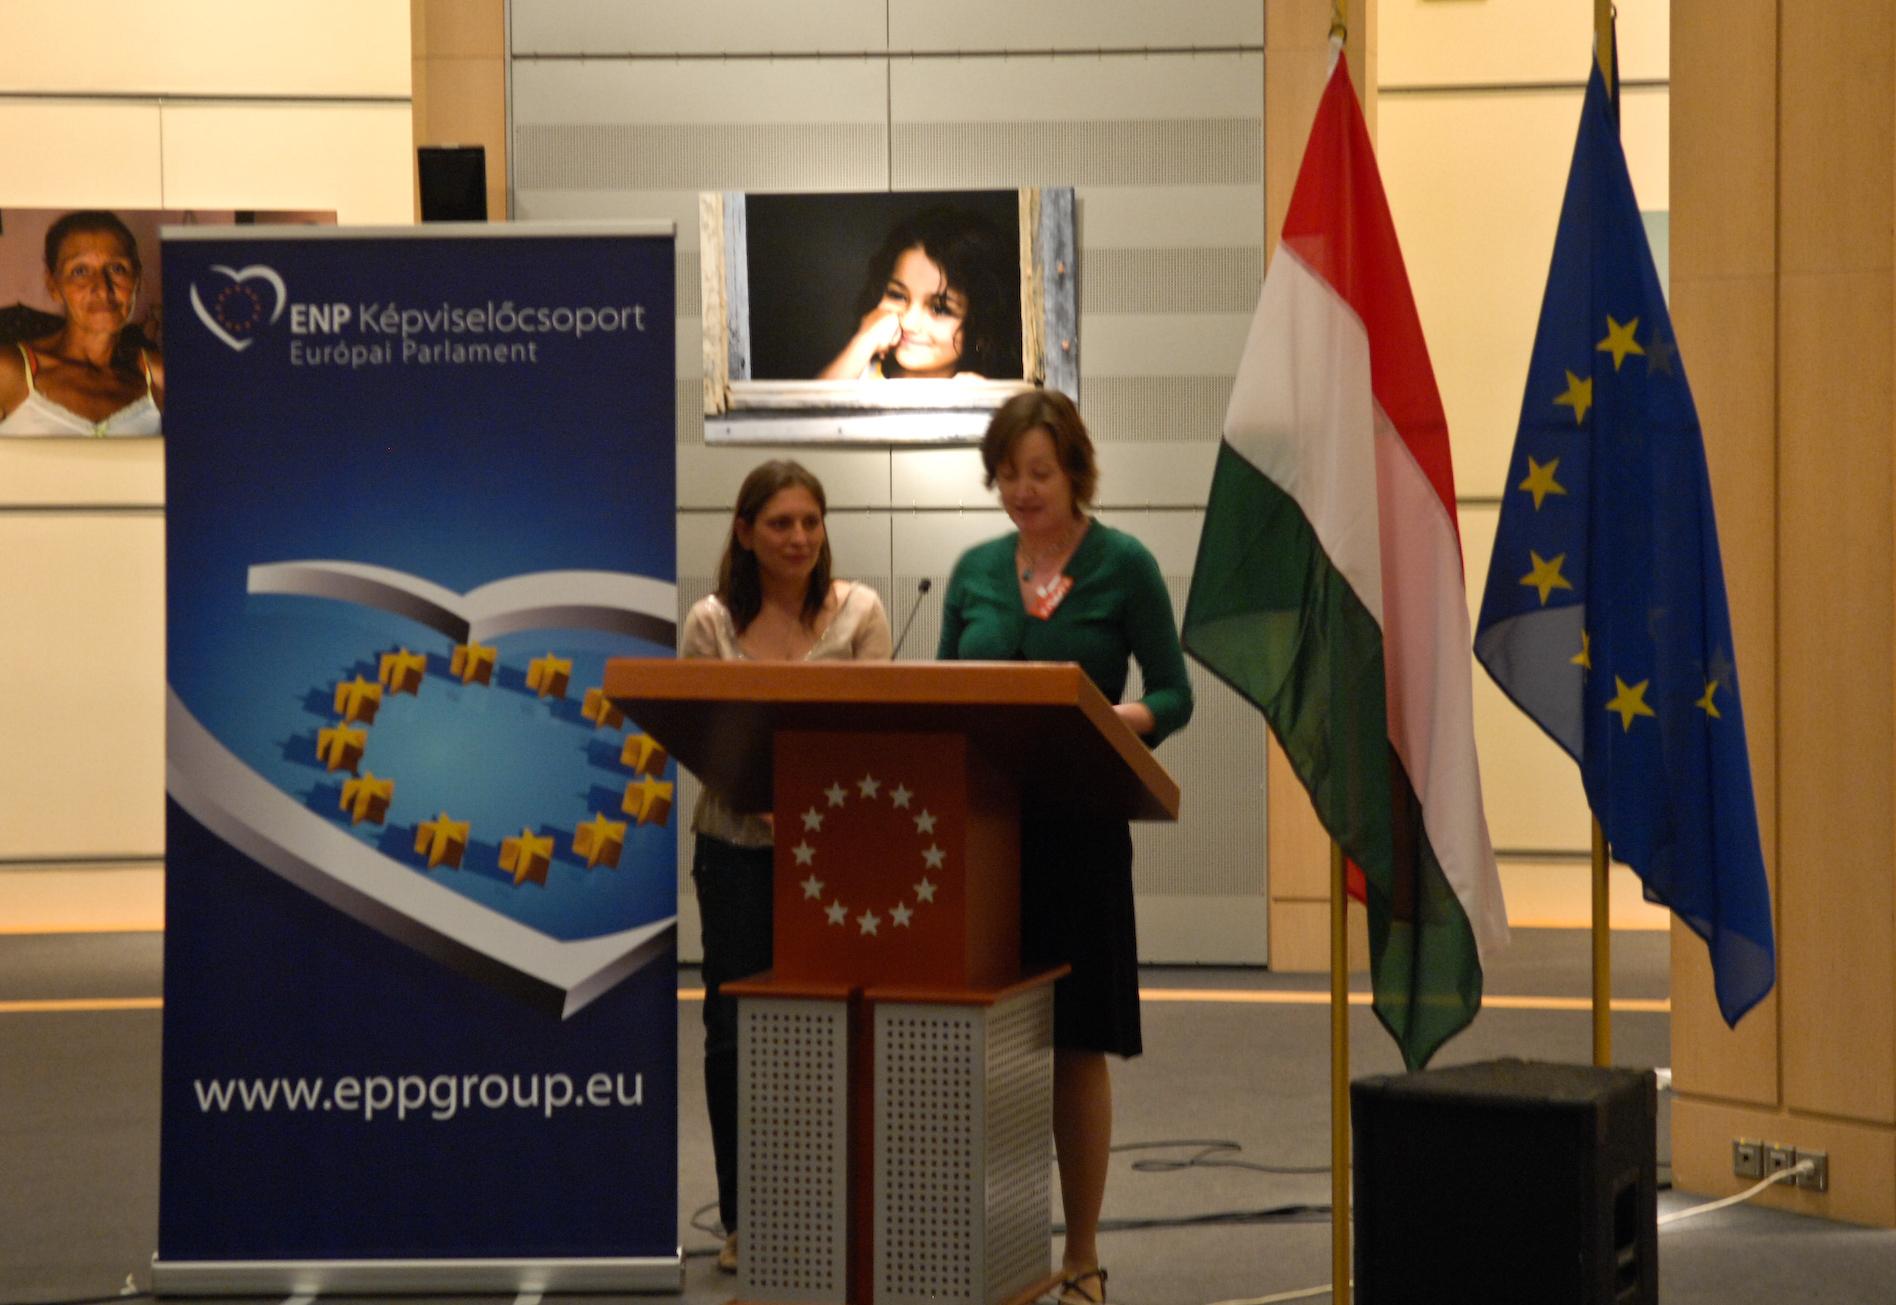 Jana Hainsworth, Eurochild and and MEP L. Járóka